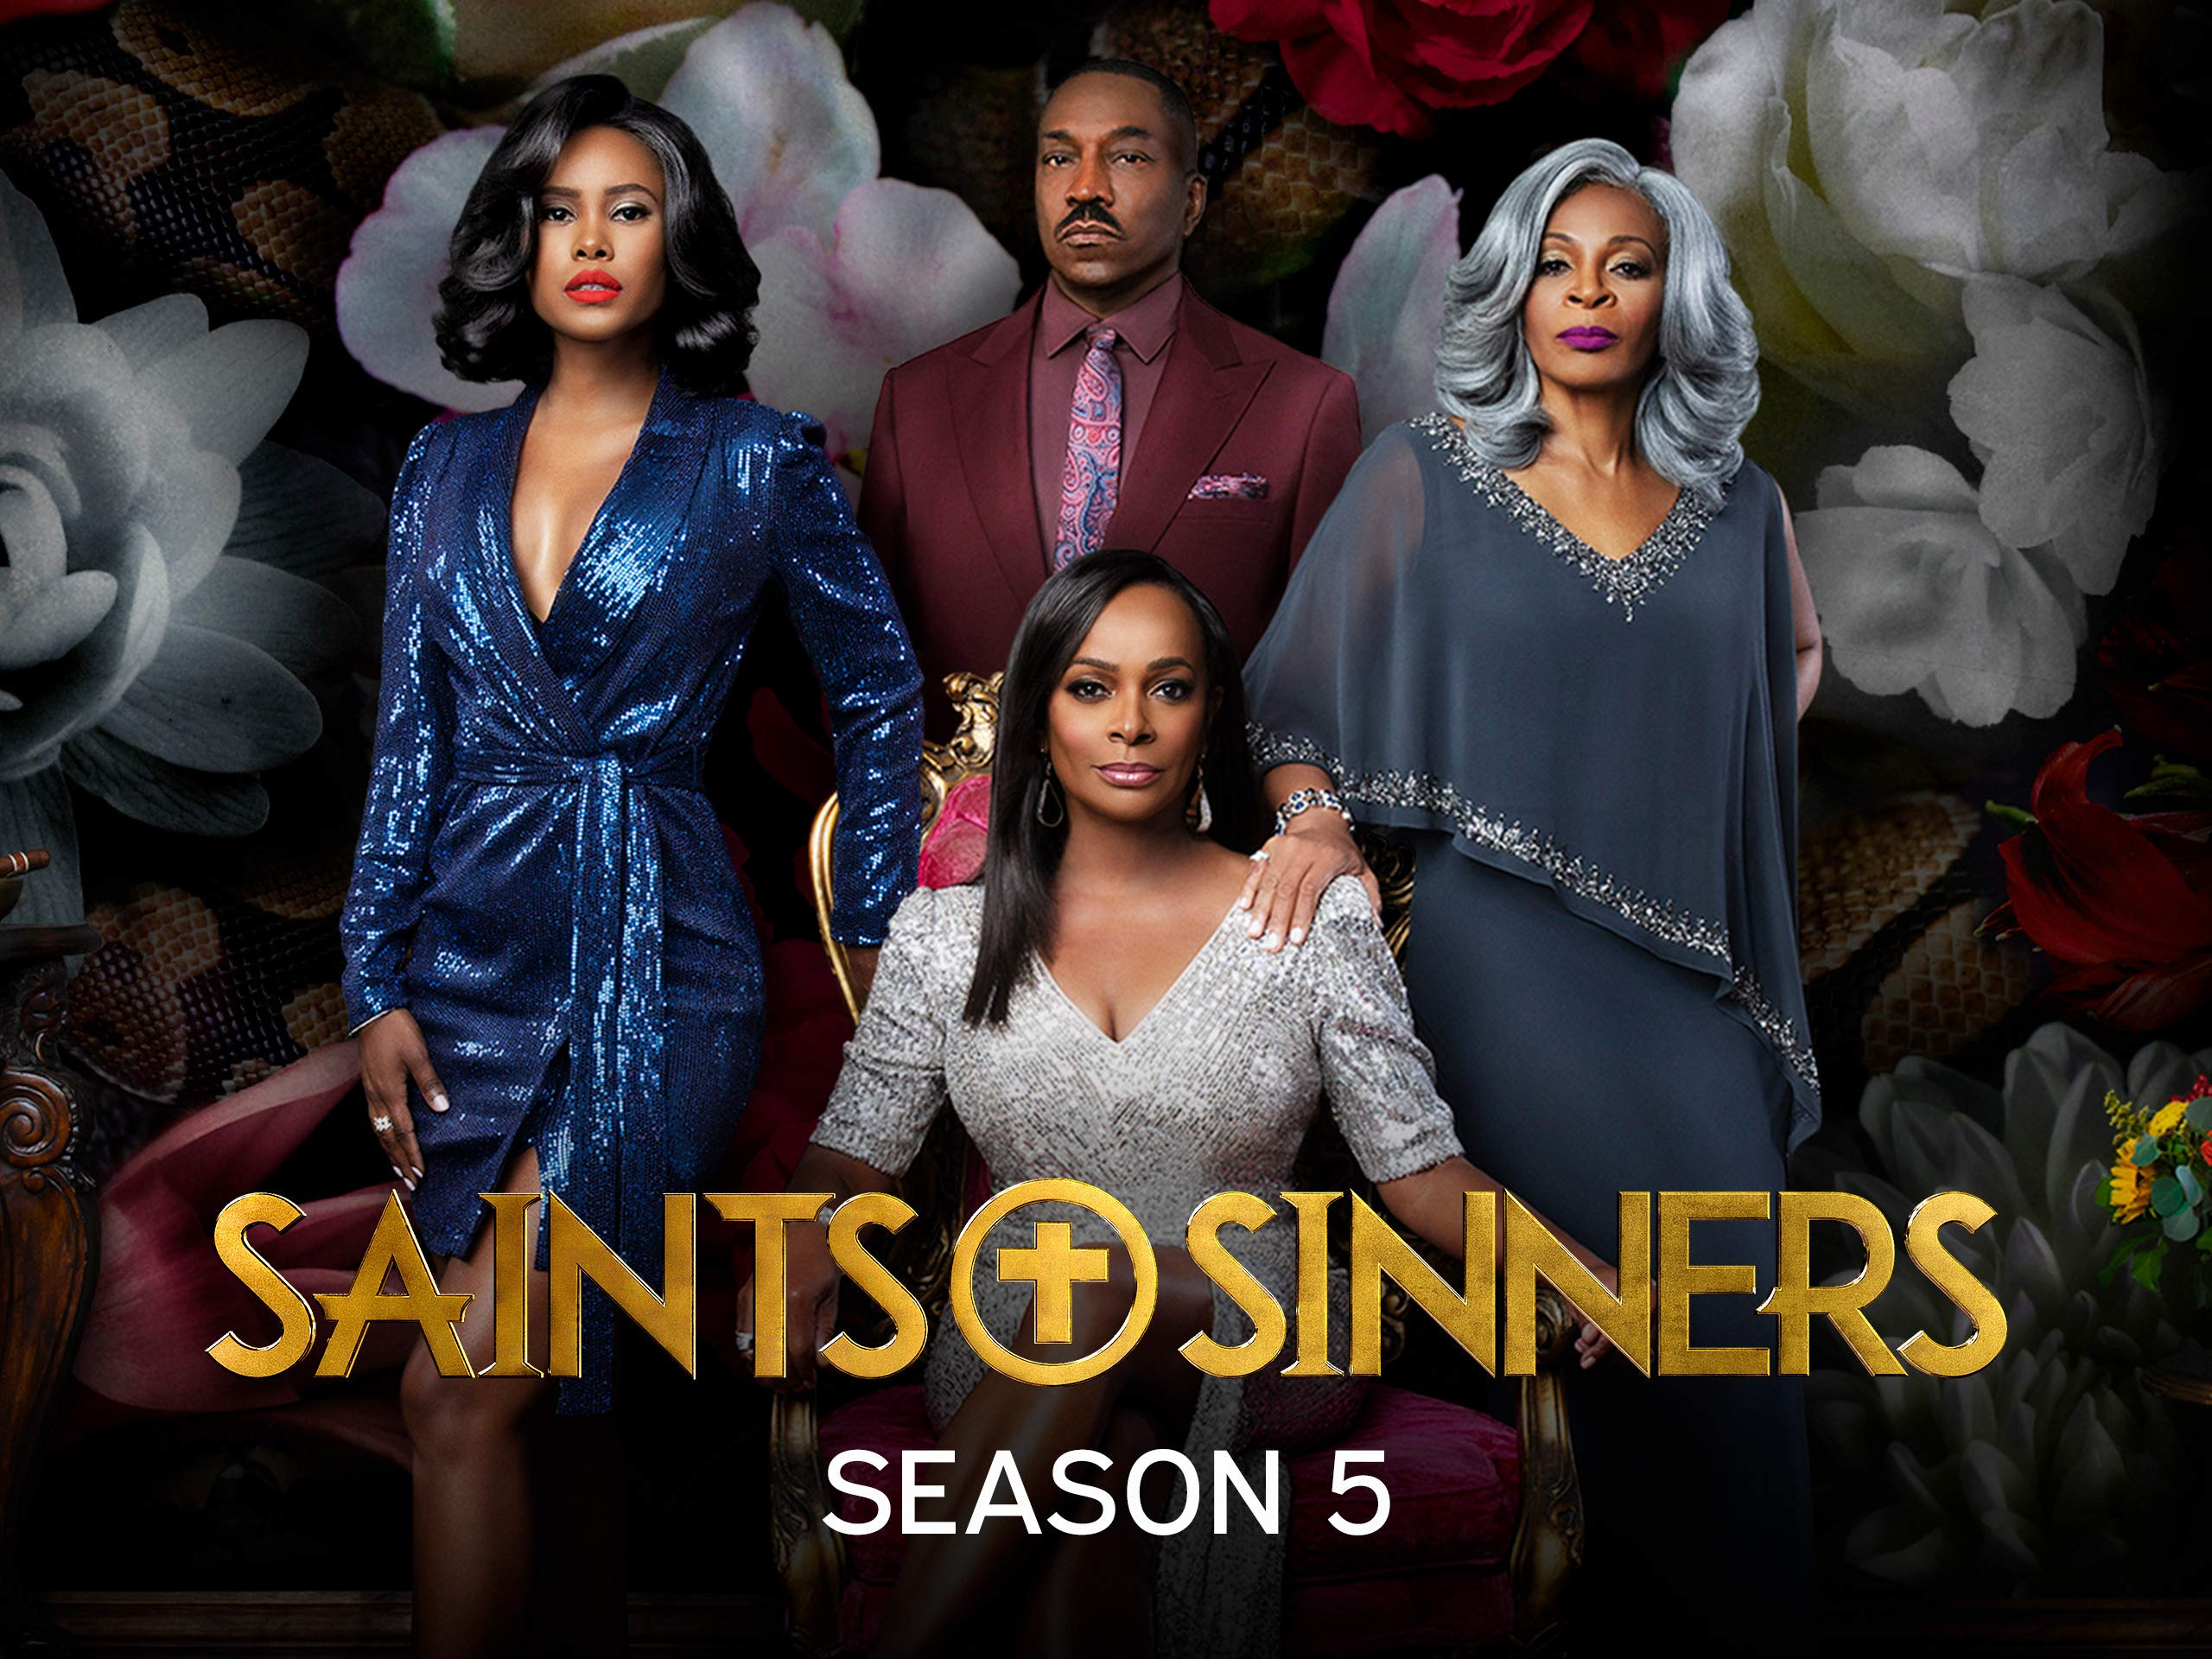 saints and sinners season 6 release date